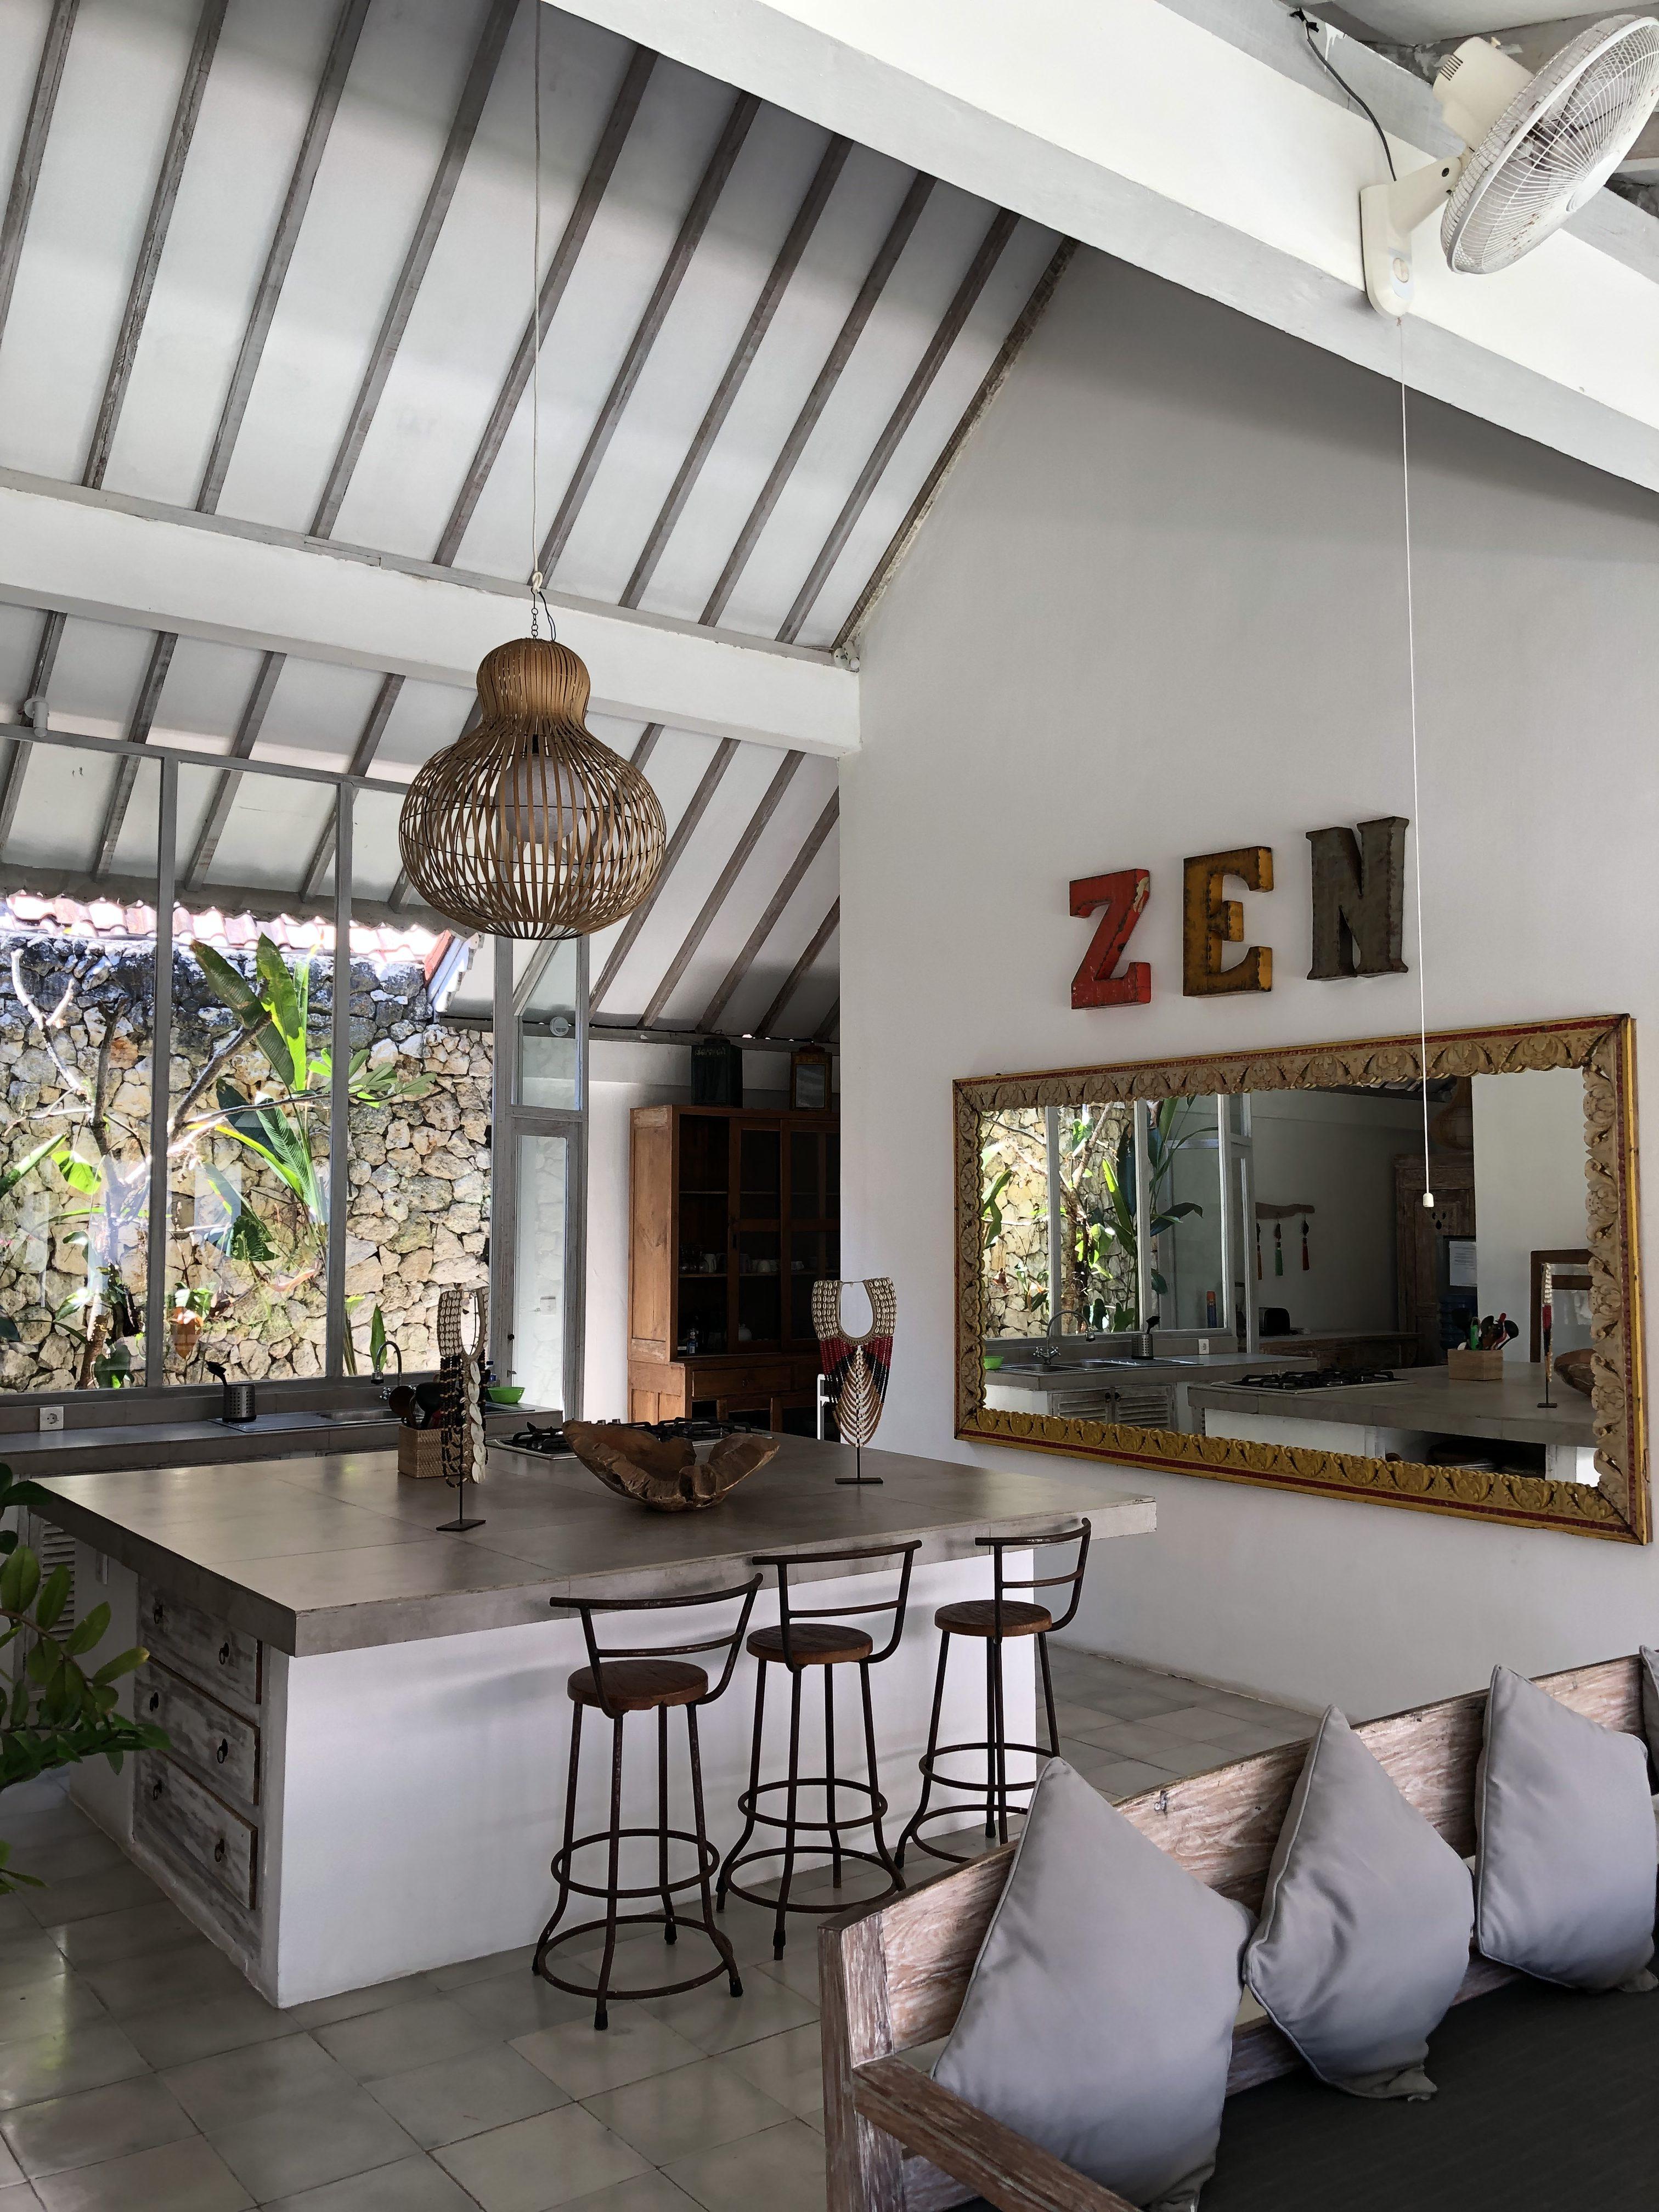 PaleOMG - Exploring Canggu & Uluwatu in Bali